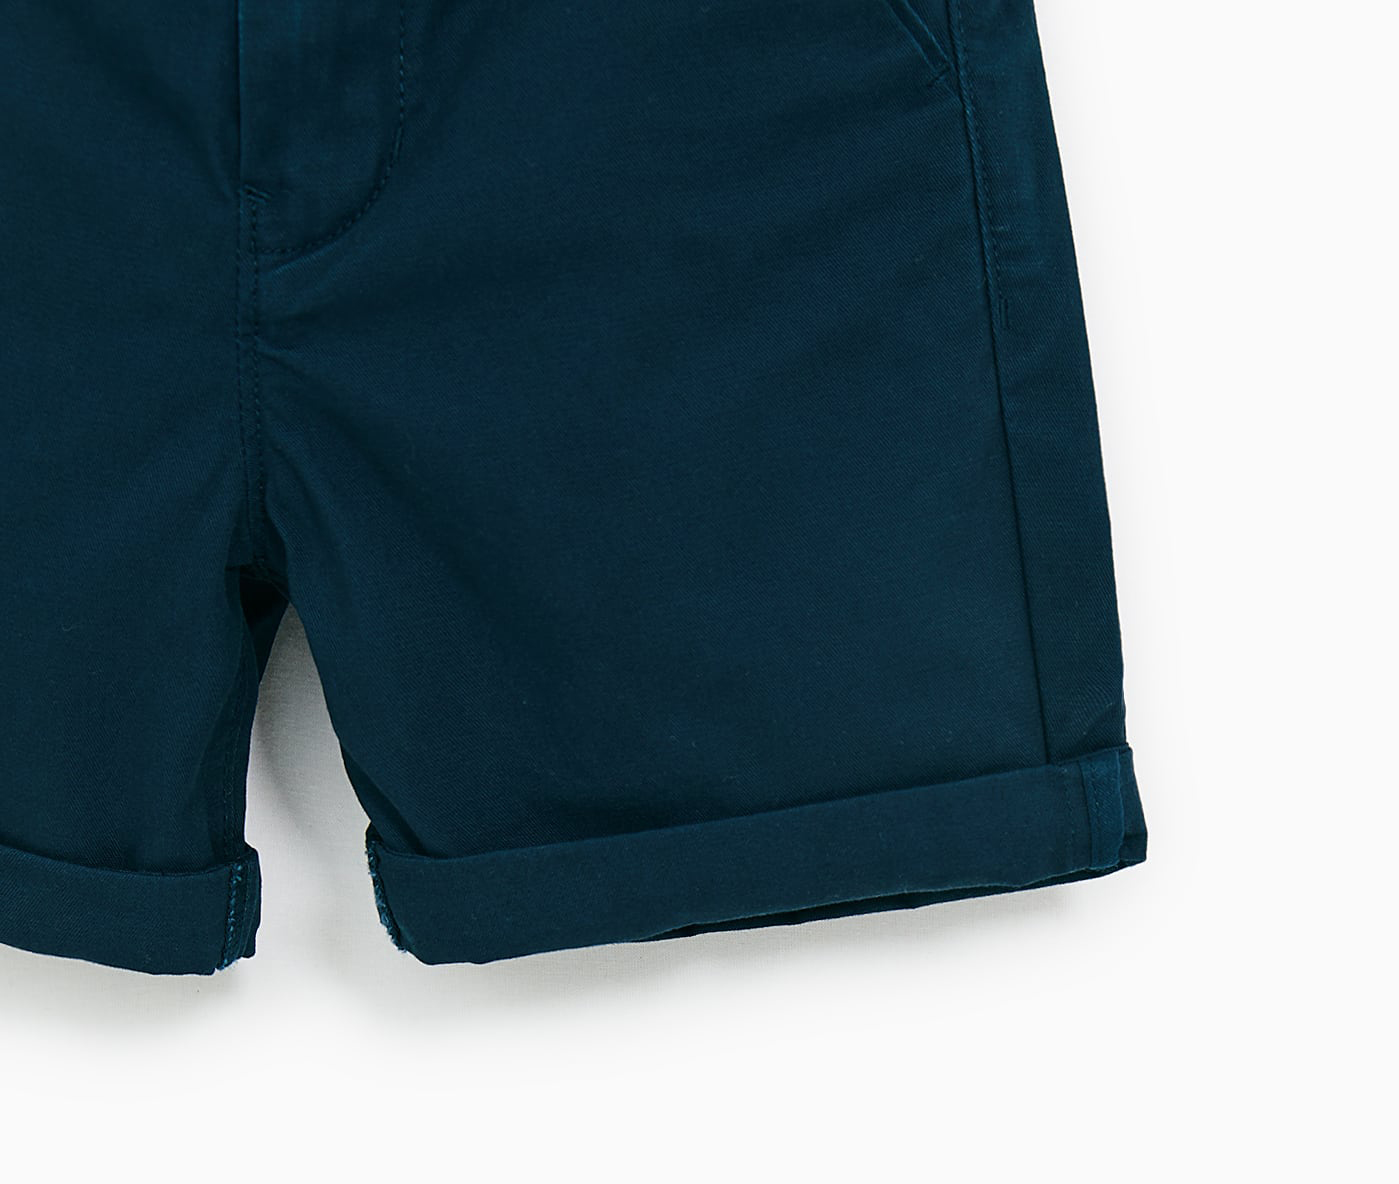 Quần short bé trai hiệu Zara - 4745660401